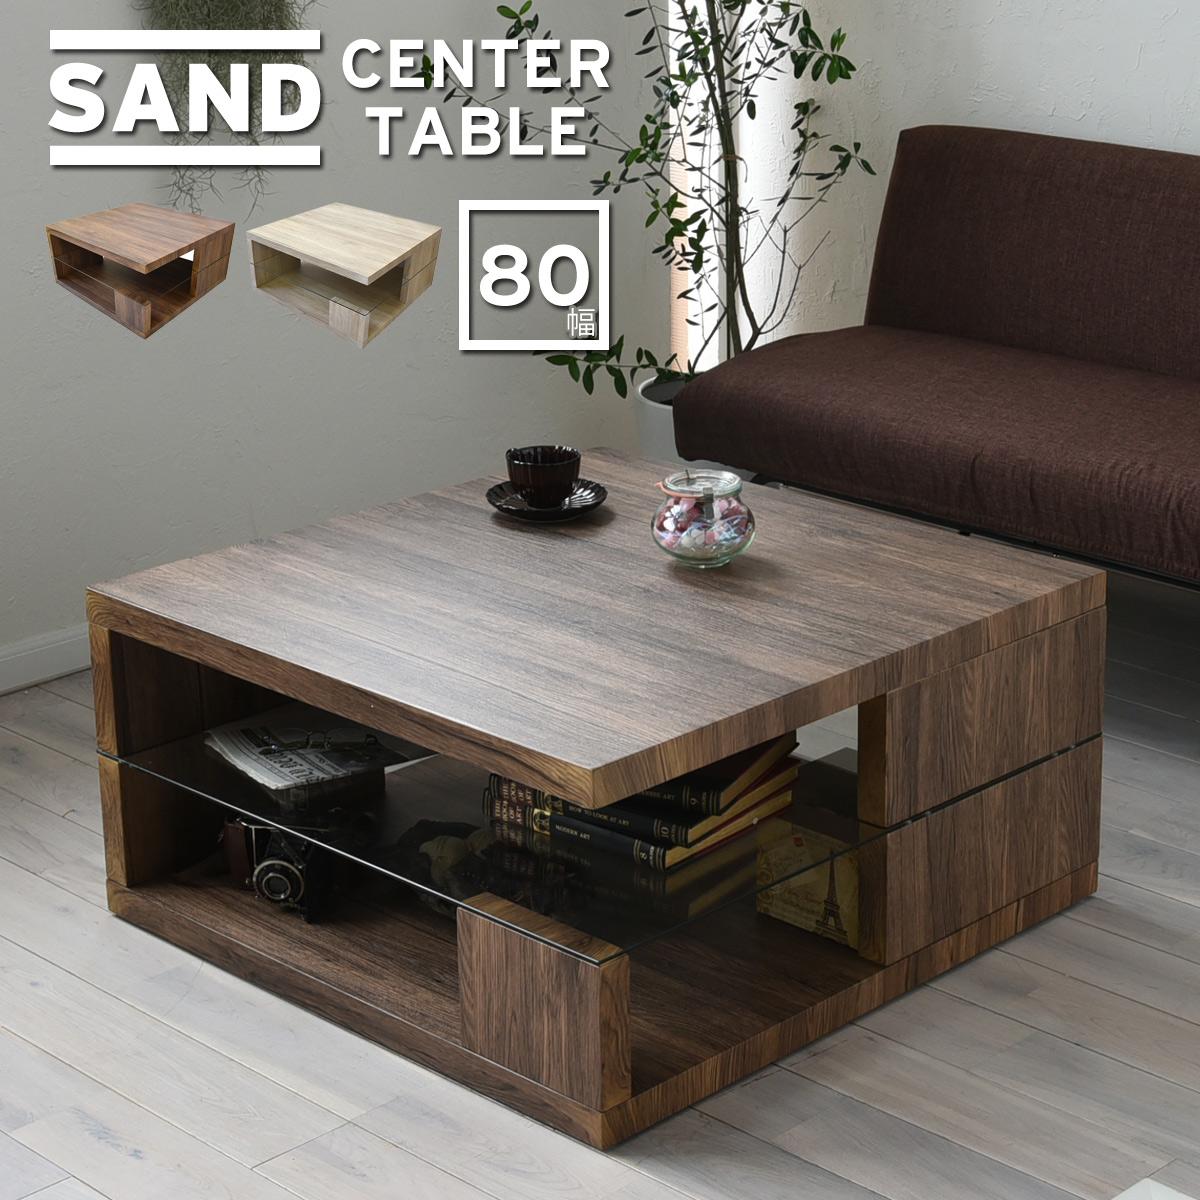 SAND センターテーブル SNCT-80 40mm厚 正方形 80×80 強化ガラス(5mm厚) ヴィンテージ調 古材風